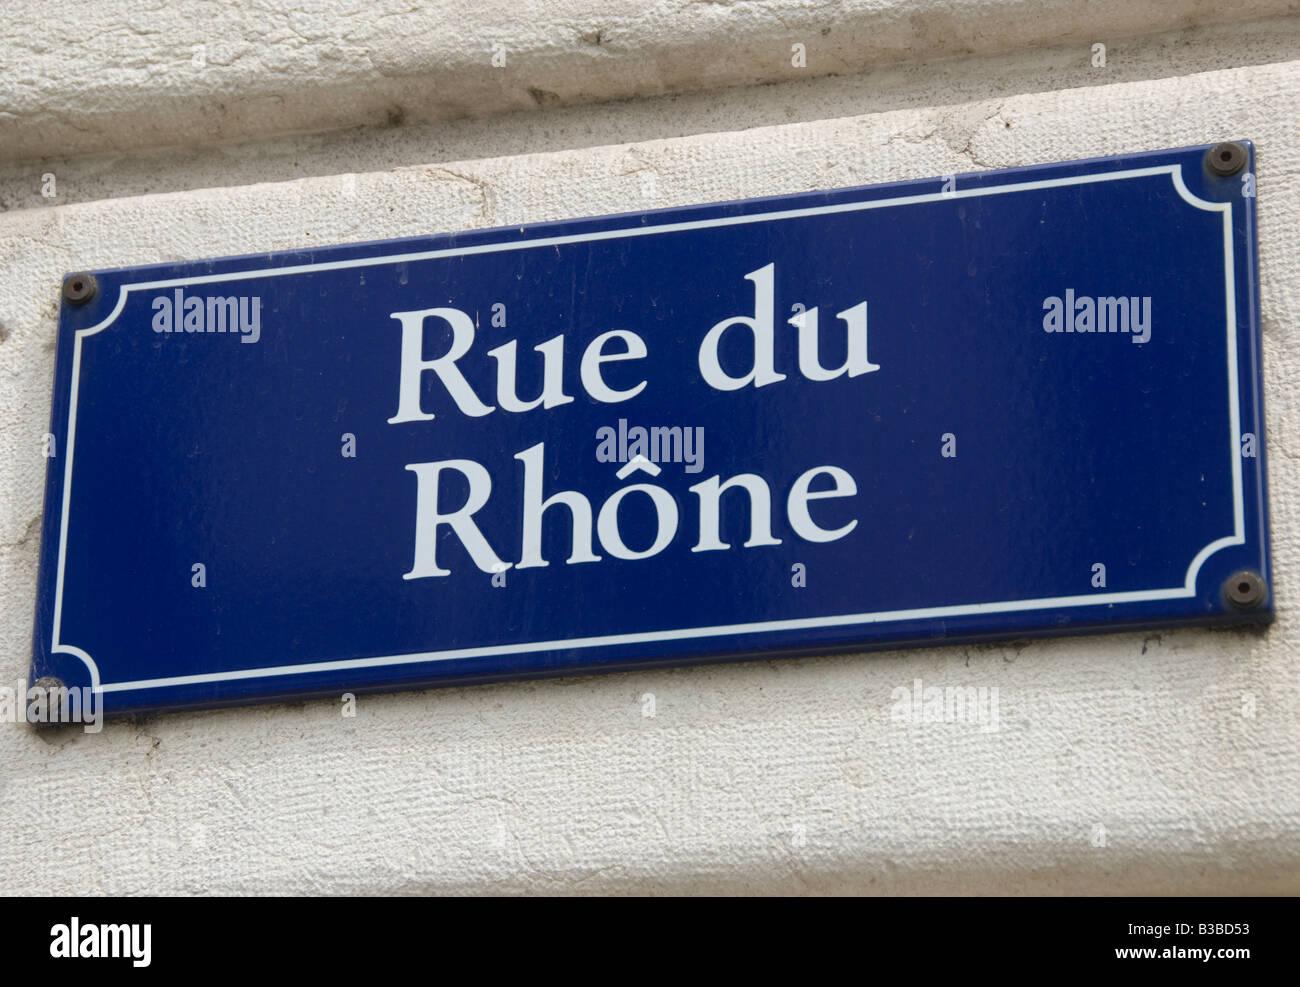 Rue de Rhone - Stock Image